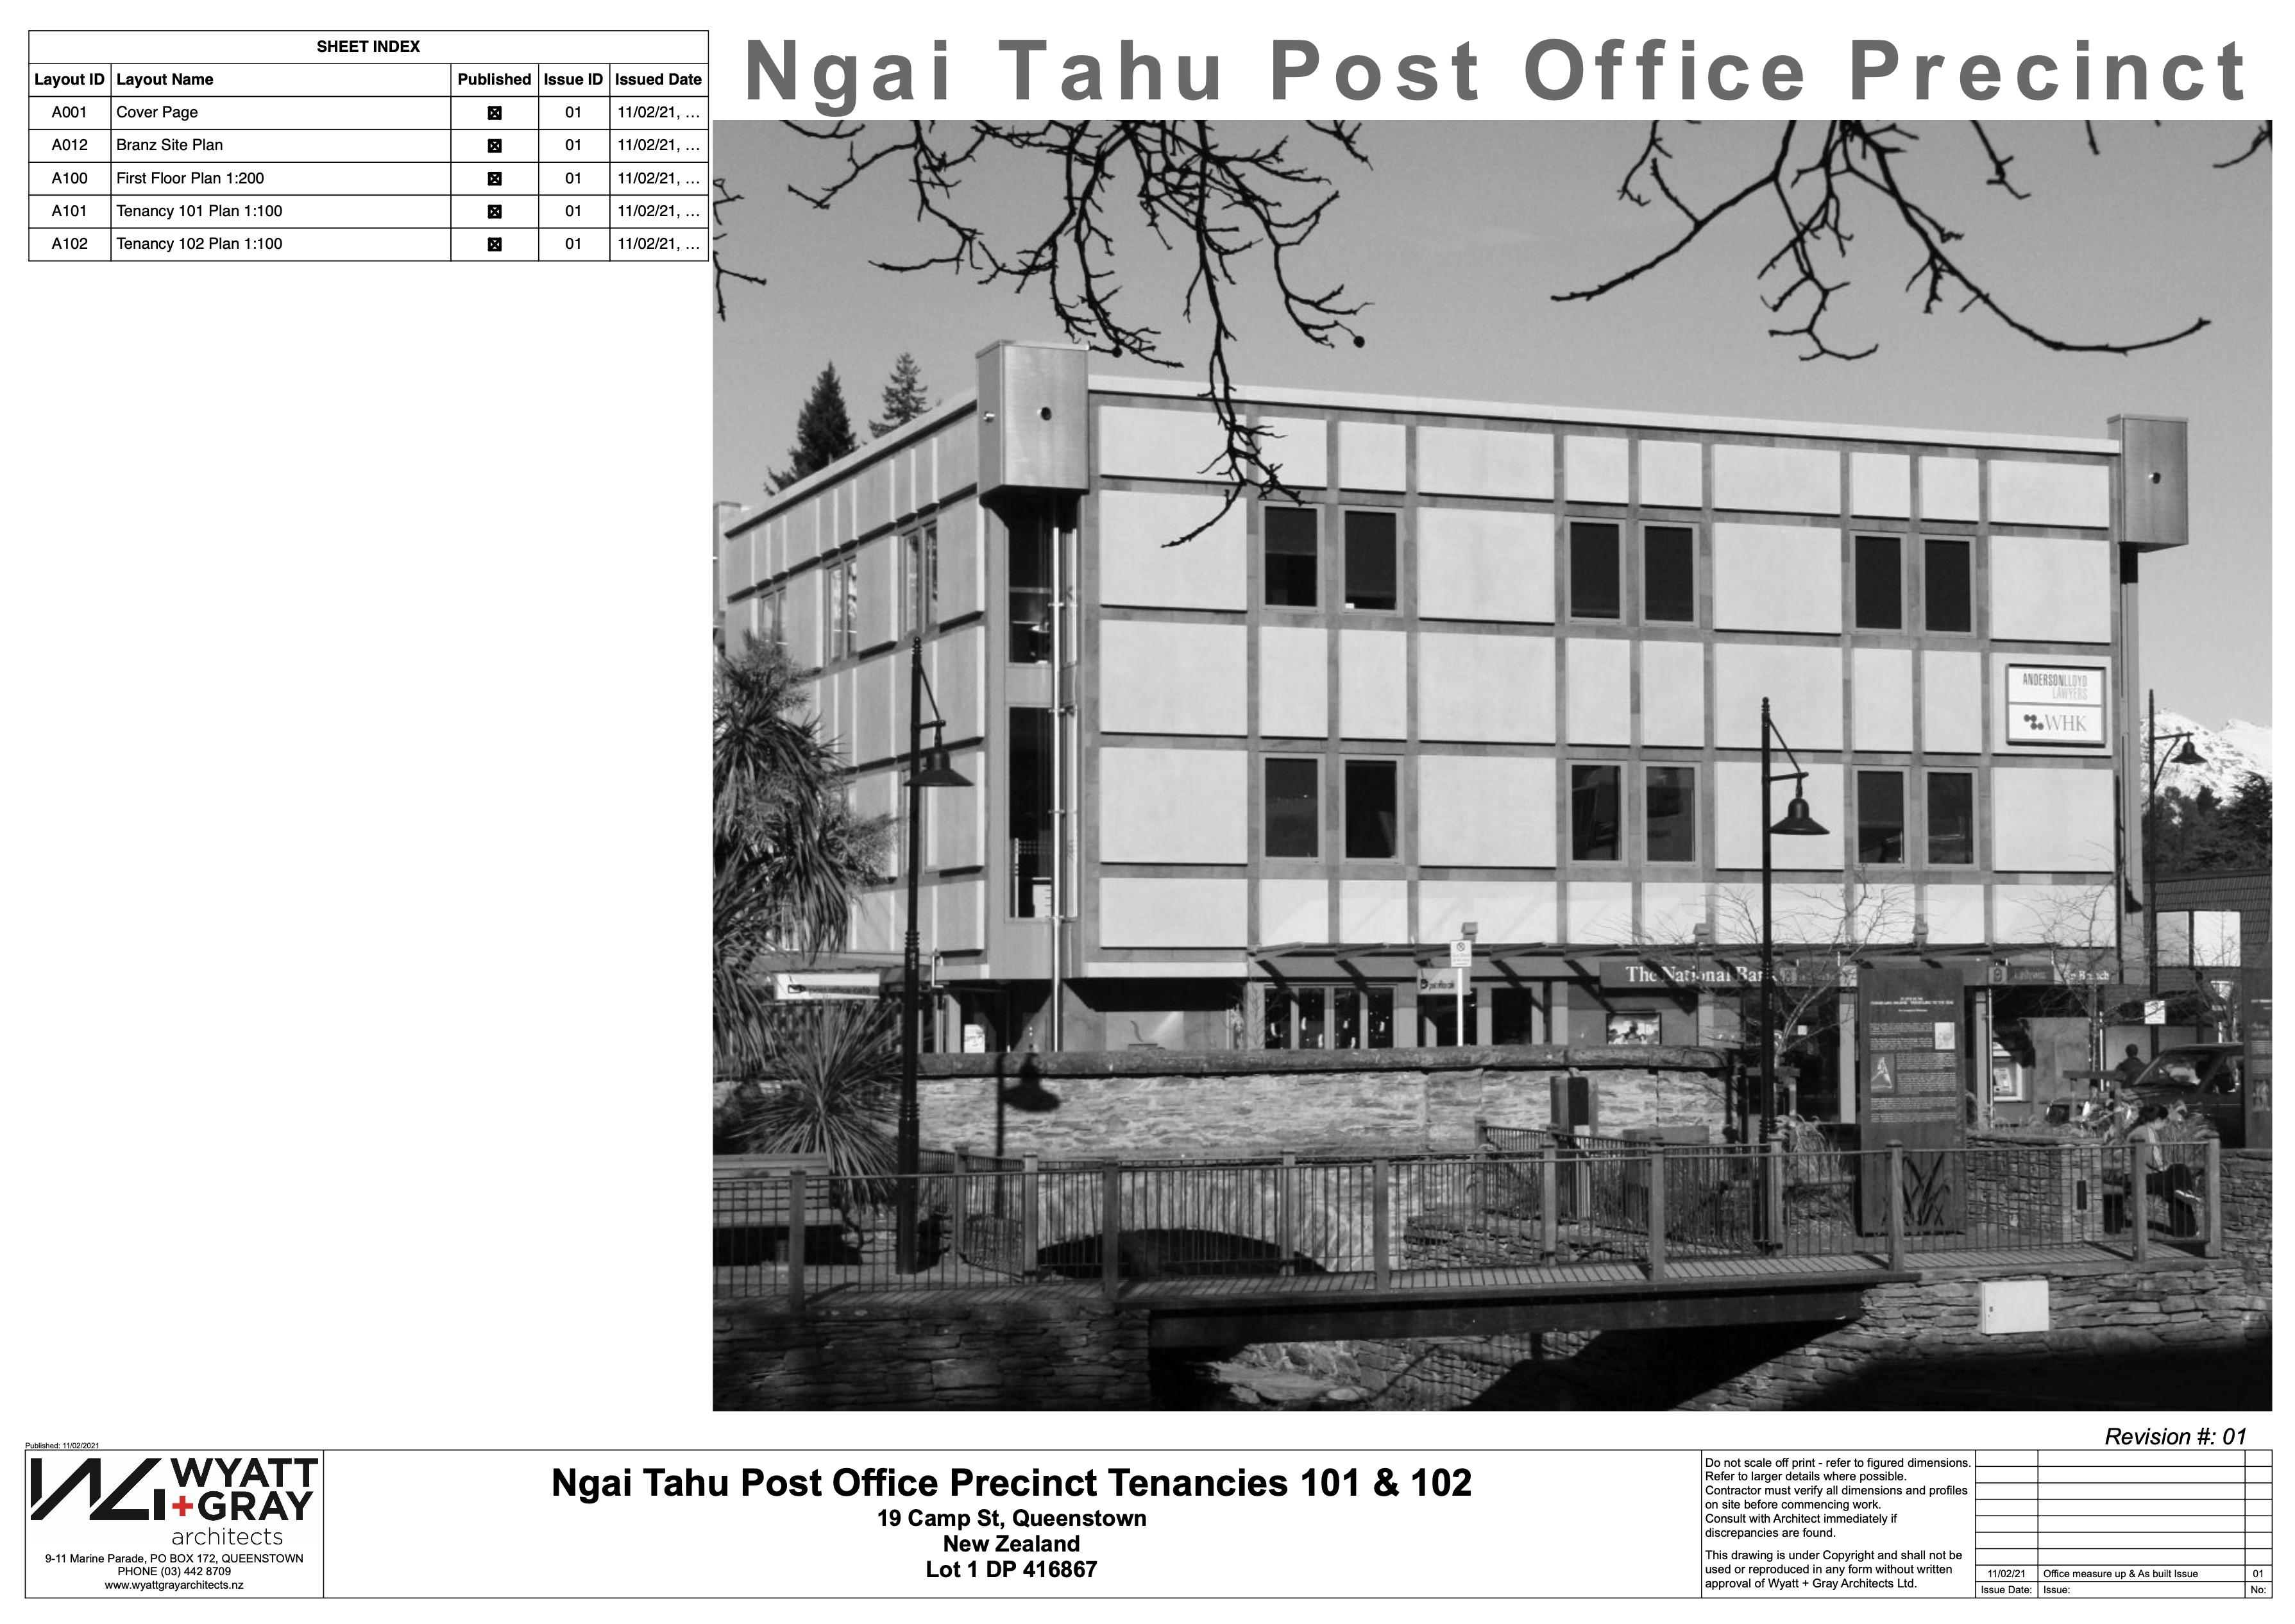 Ngai Tahu Post Office Precinct